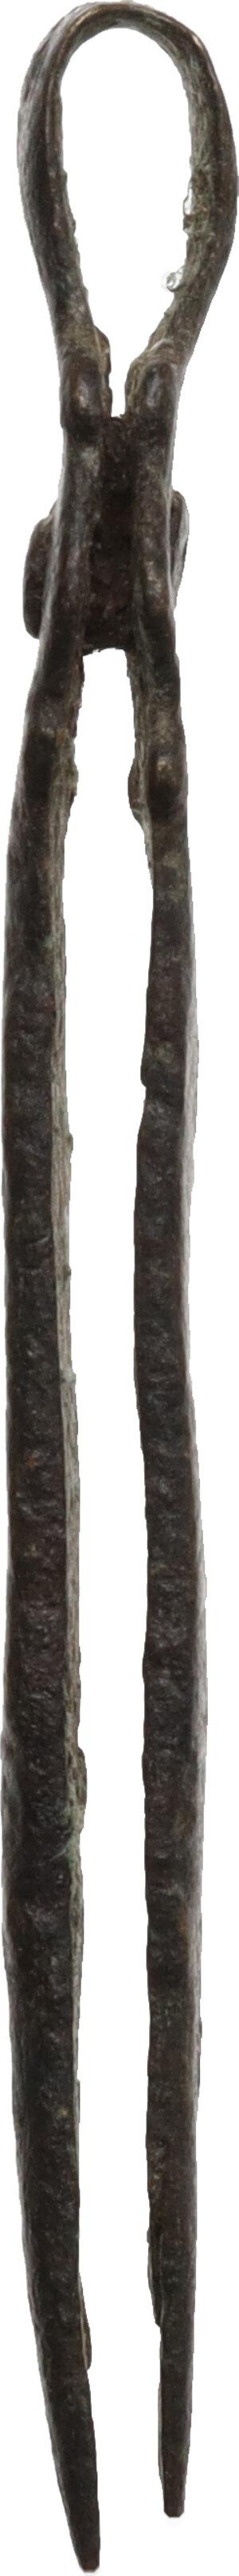 reverse: Bronze tweezers.  Roman period, 1st - 3rd century AD.  56 mm